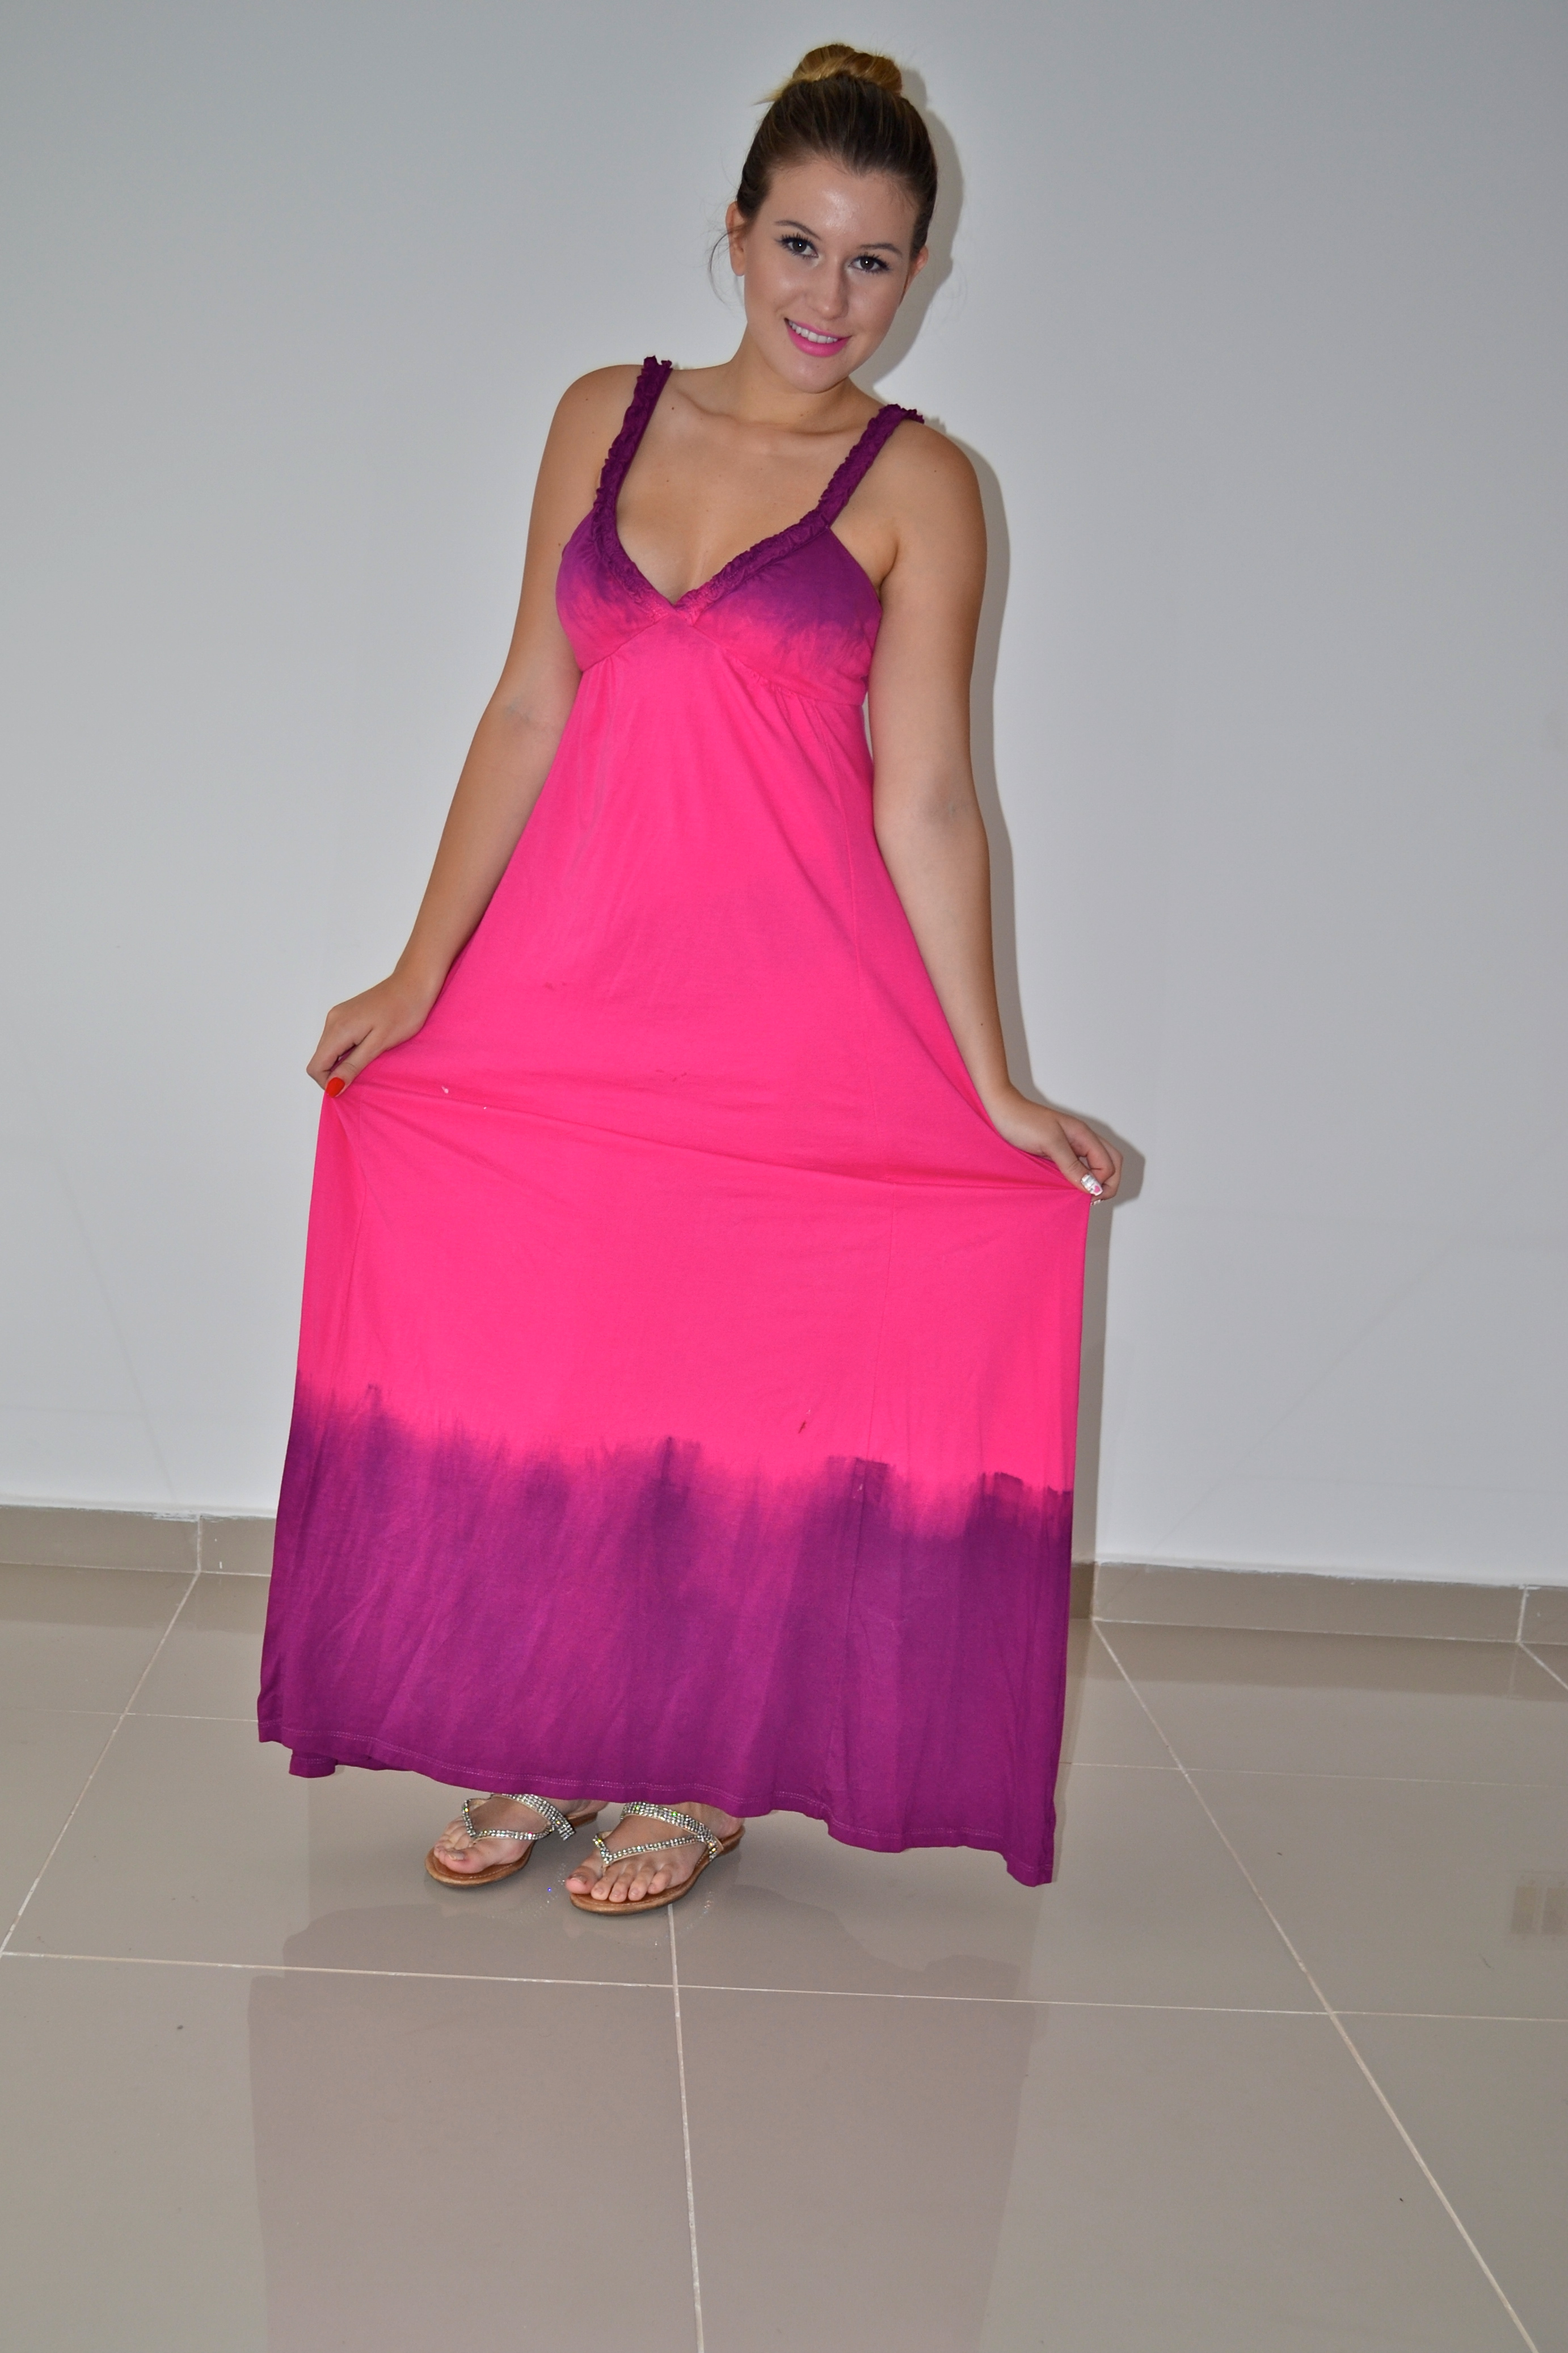 ec36860a5 Look do dia: Vestido longo degradê - Niina Secrets